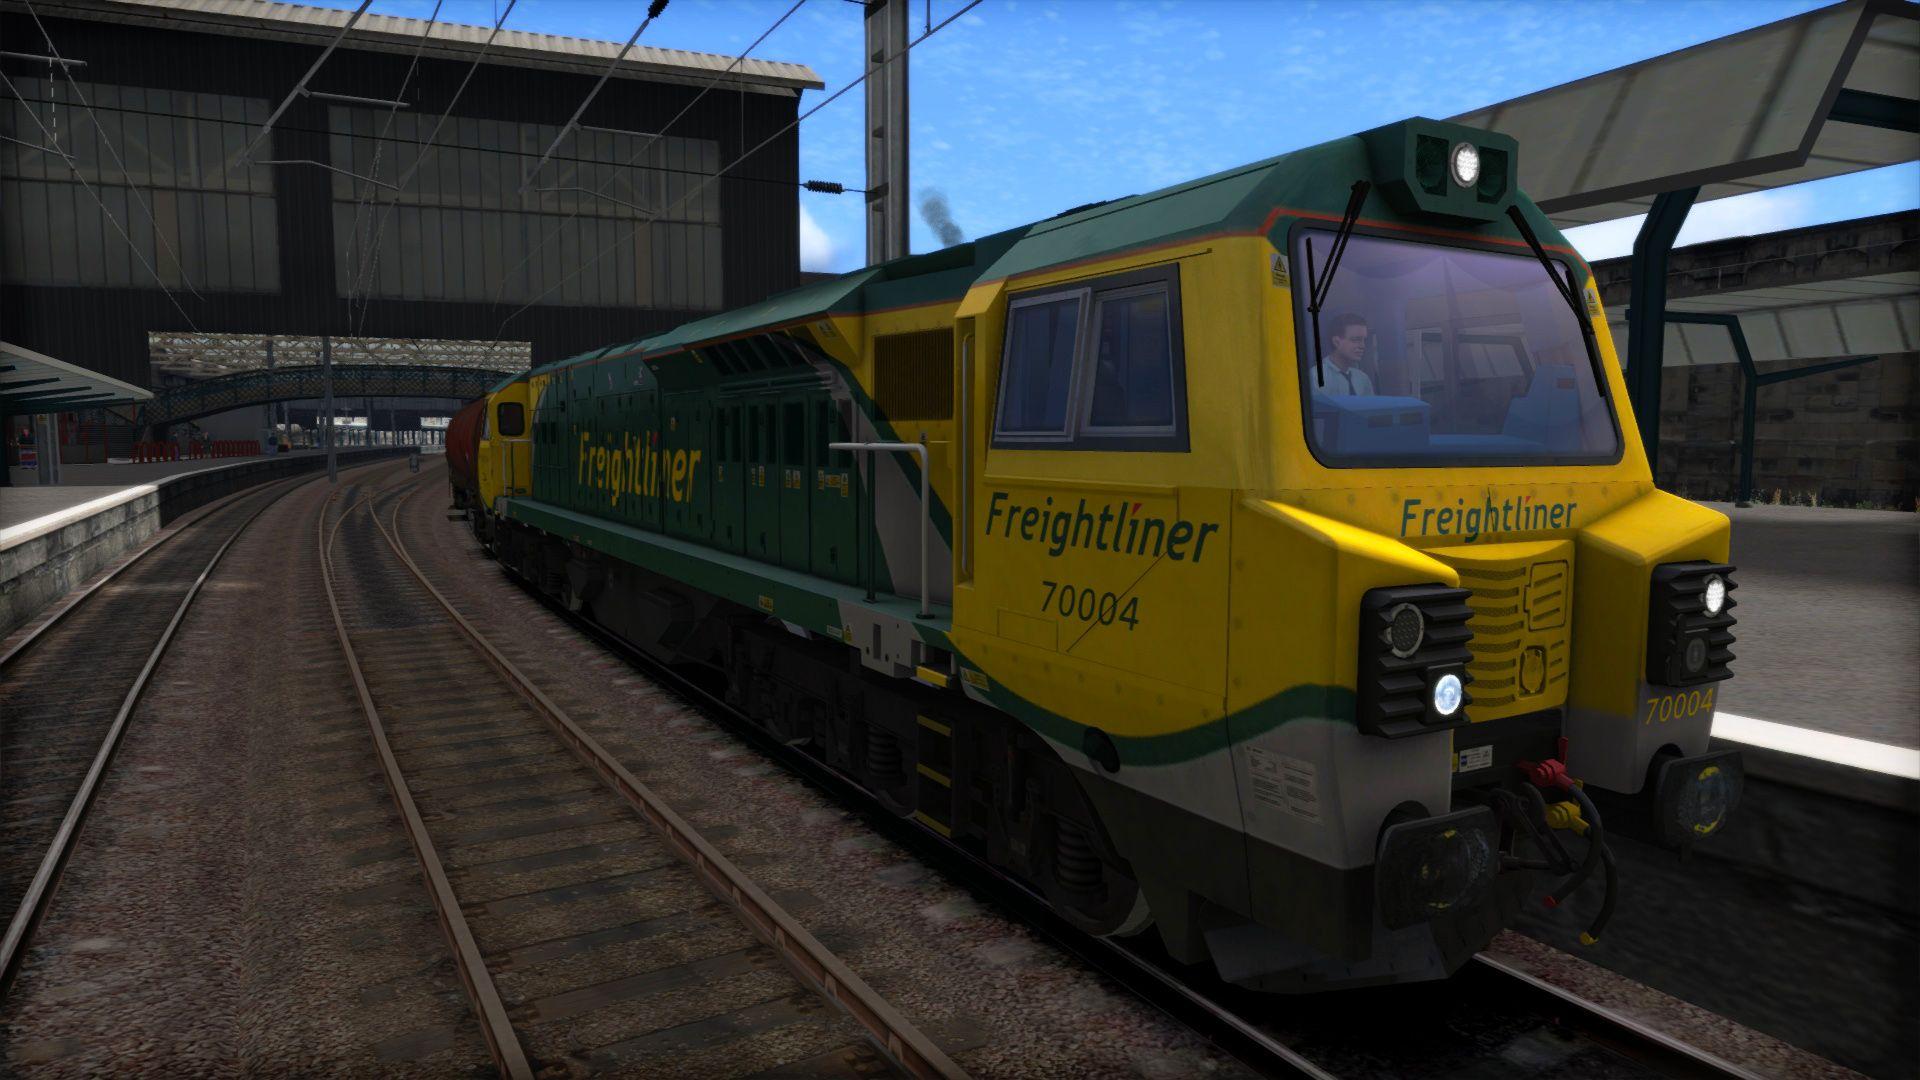 FL701